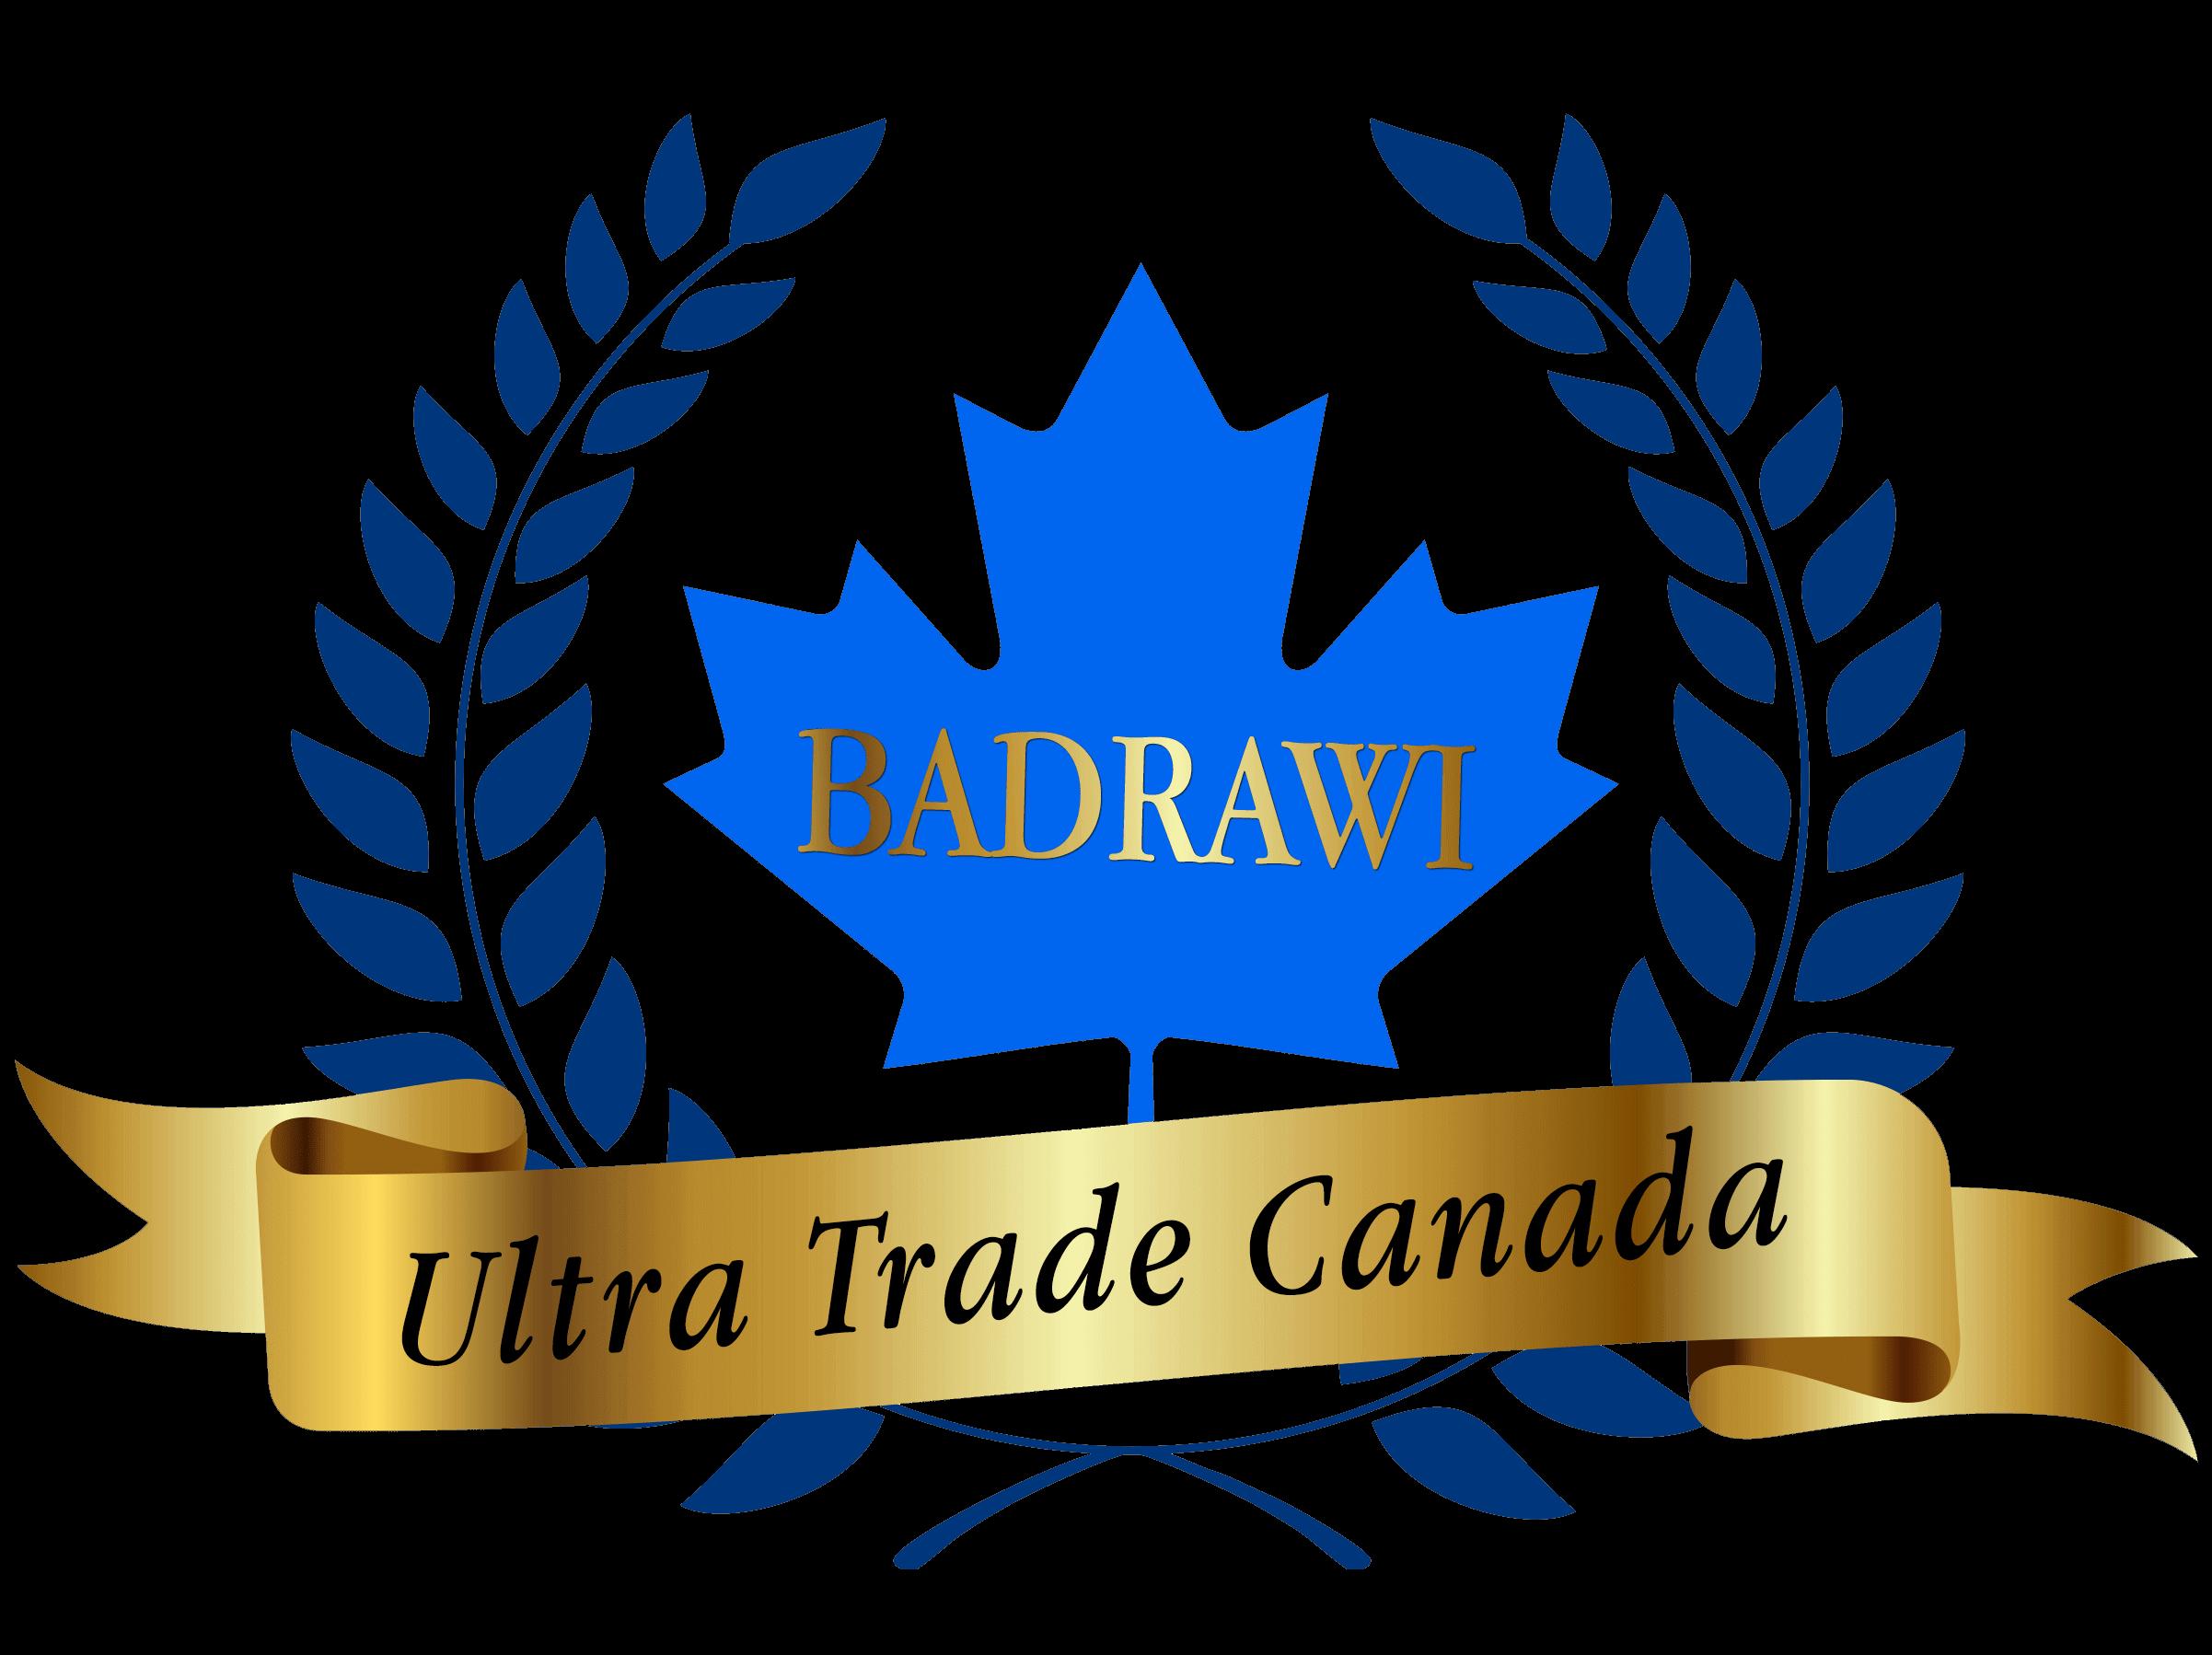 BADRAWI Ultra Trade Canada